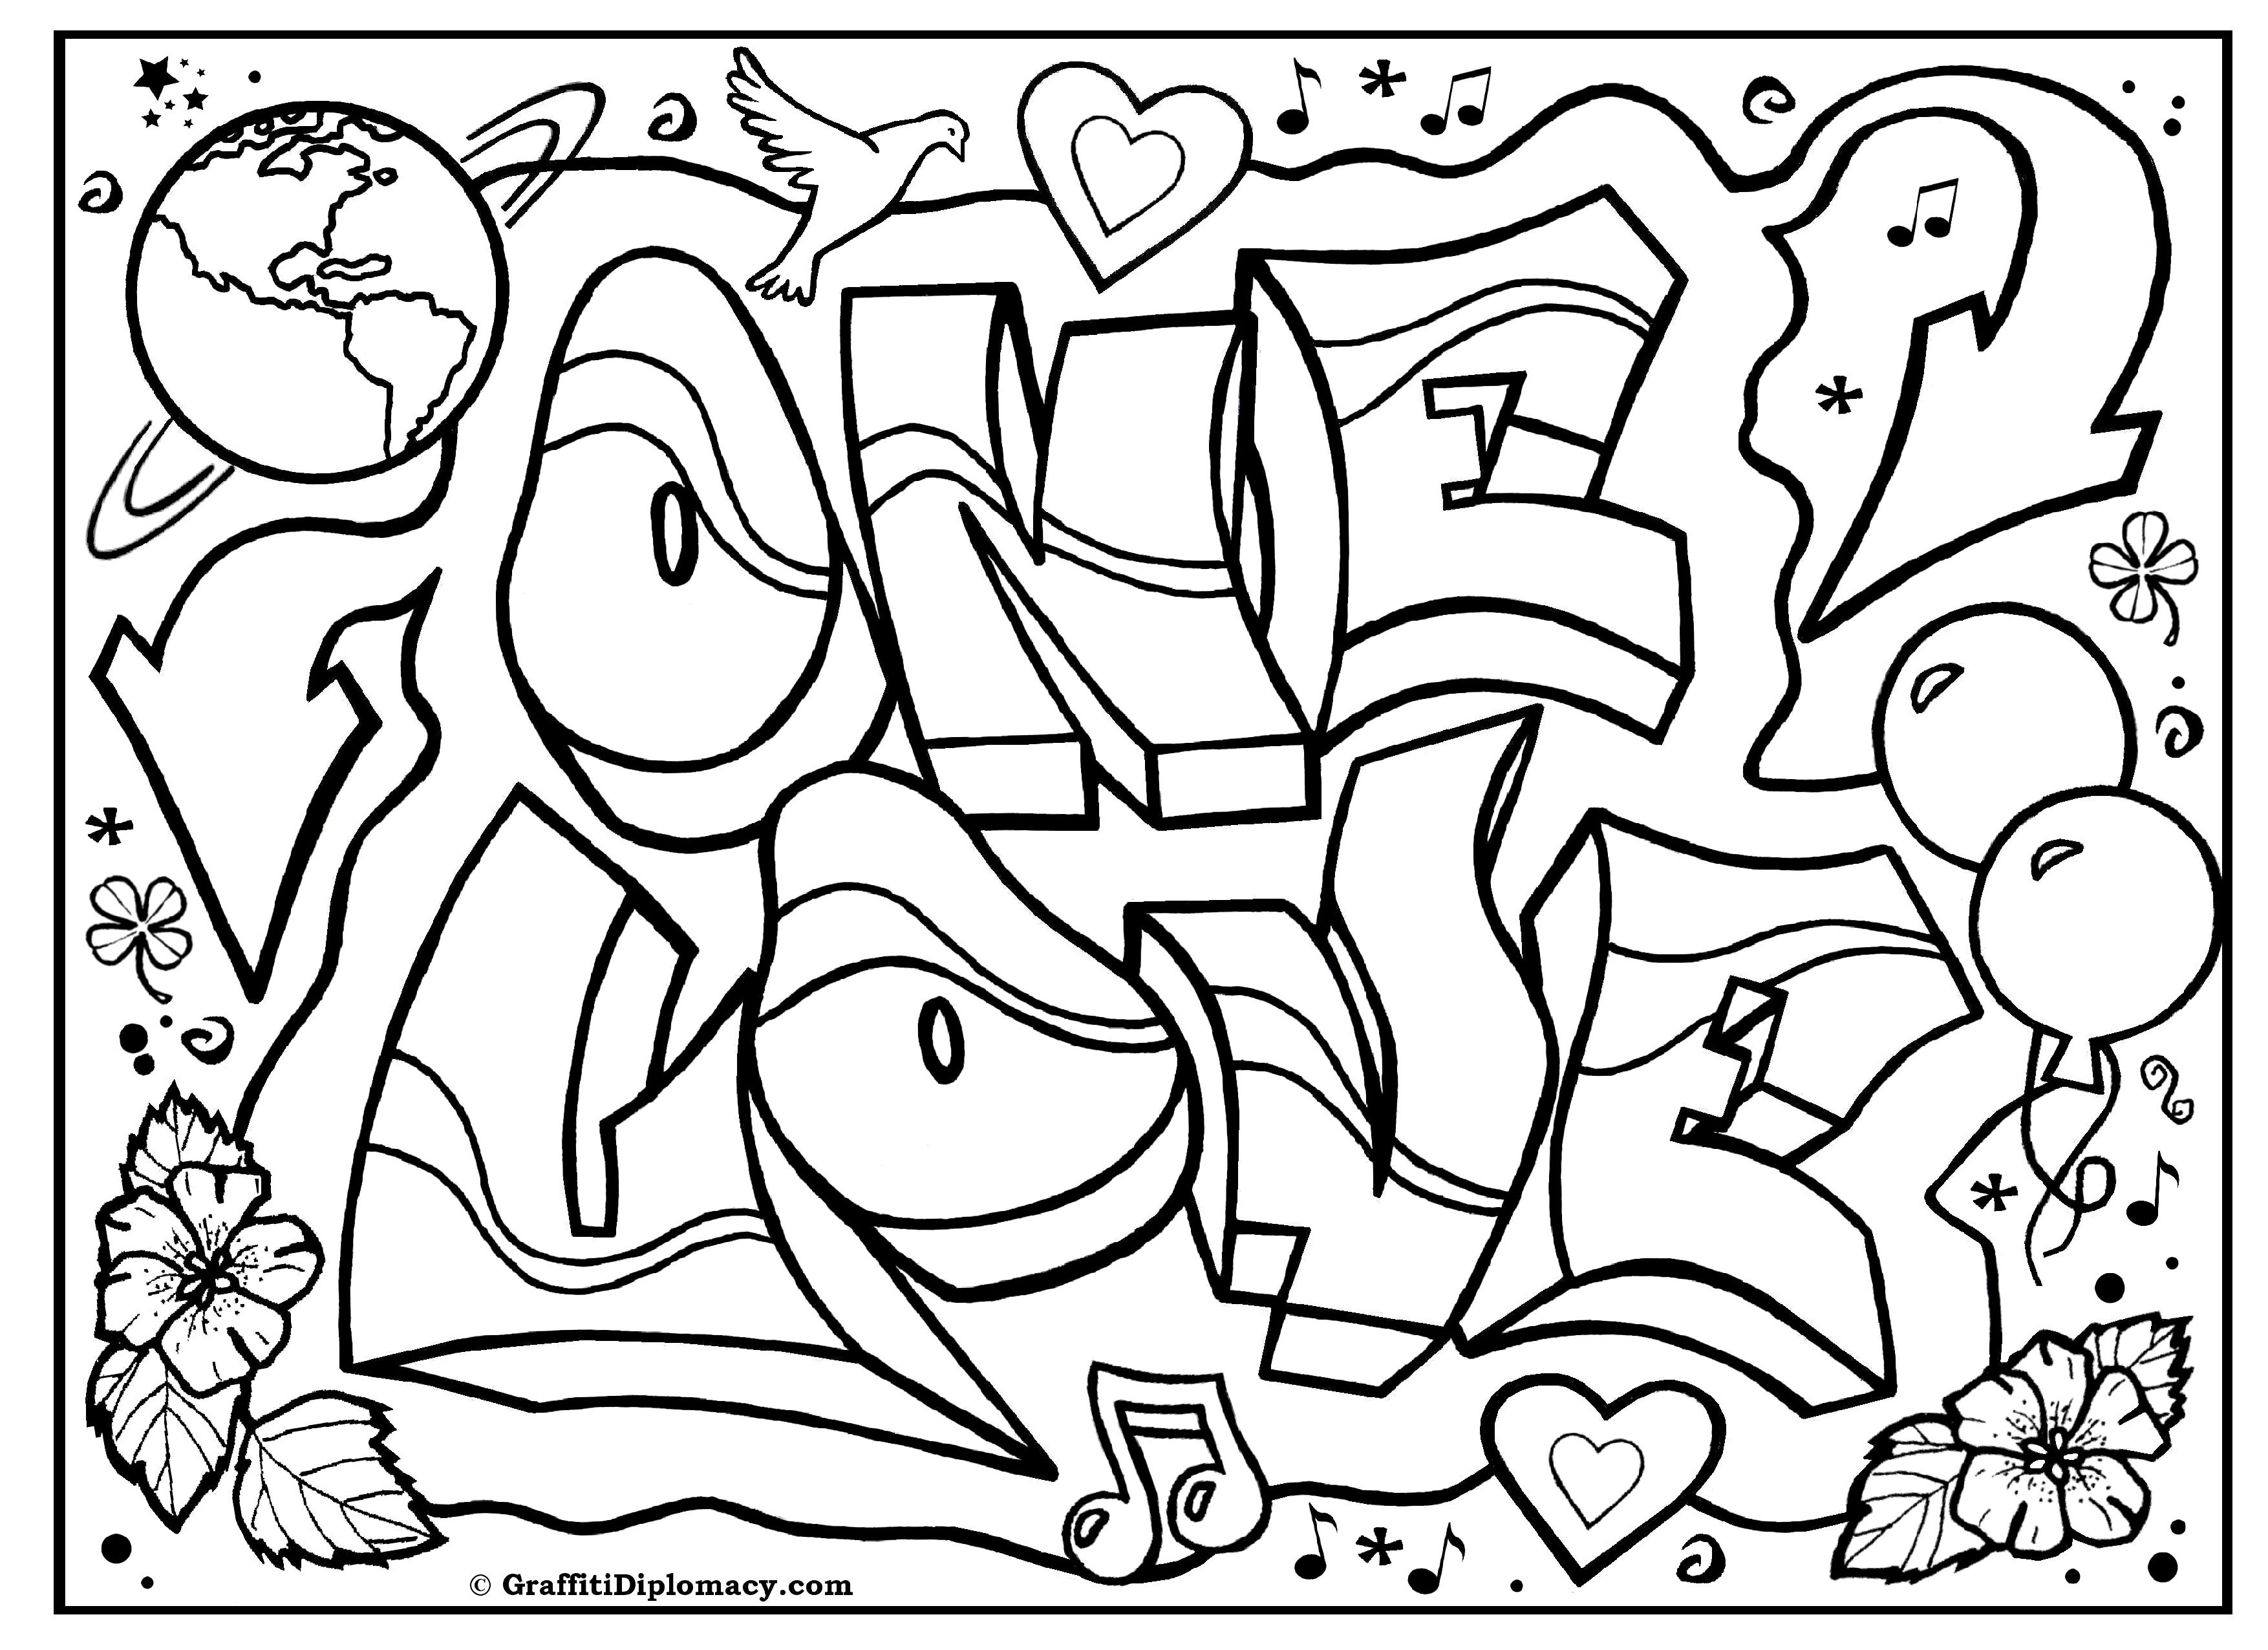 Coole Ausmalbilder Graffiti Genial Graffiti Schrift Ausmalbilder New 35 Ausmalbilder Graffiti Bilder